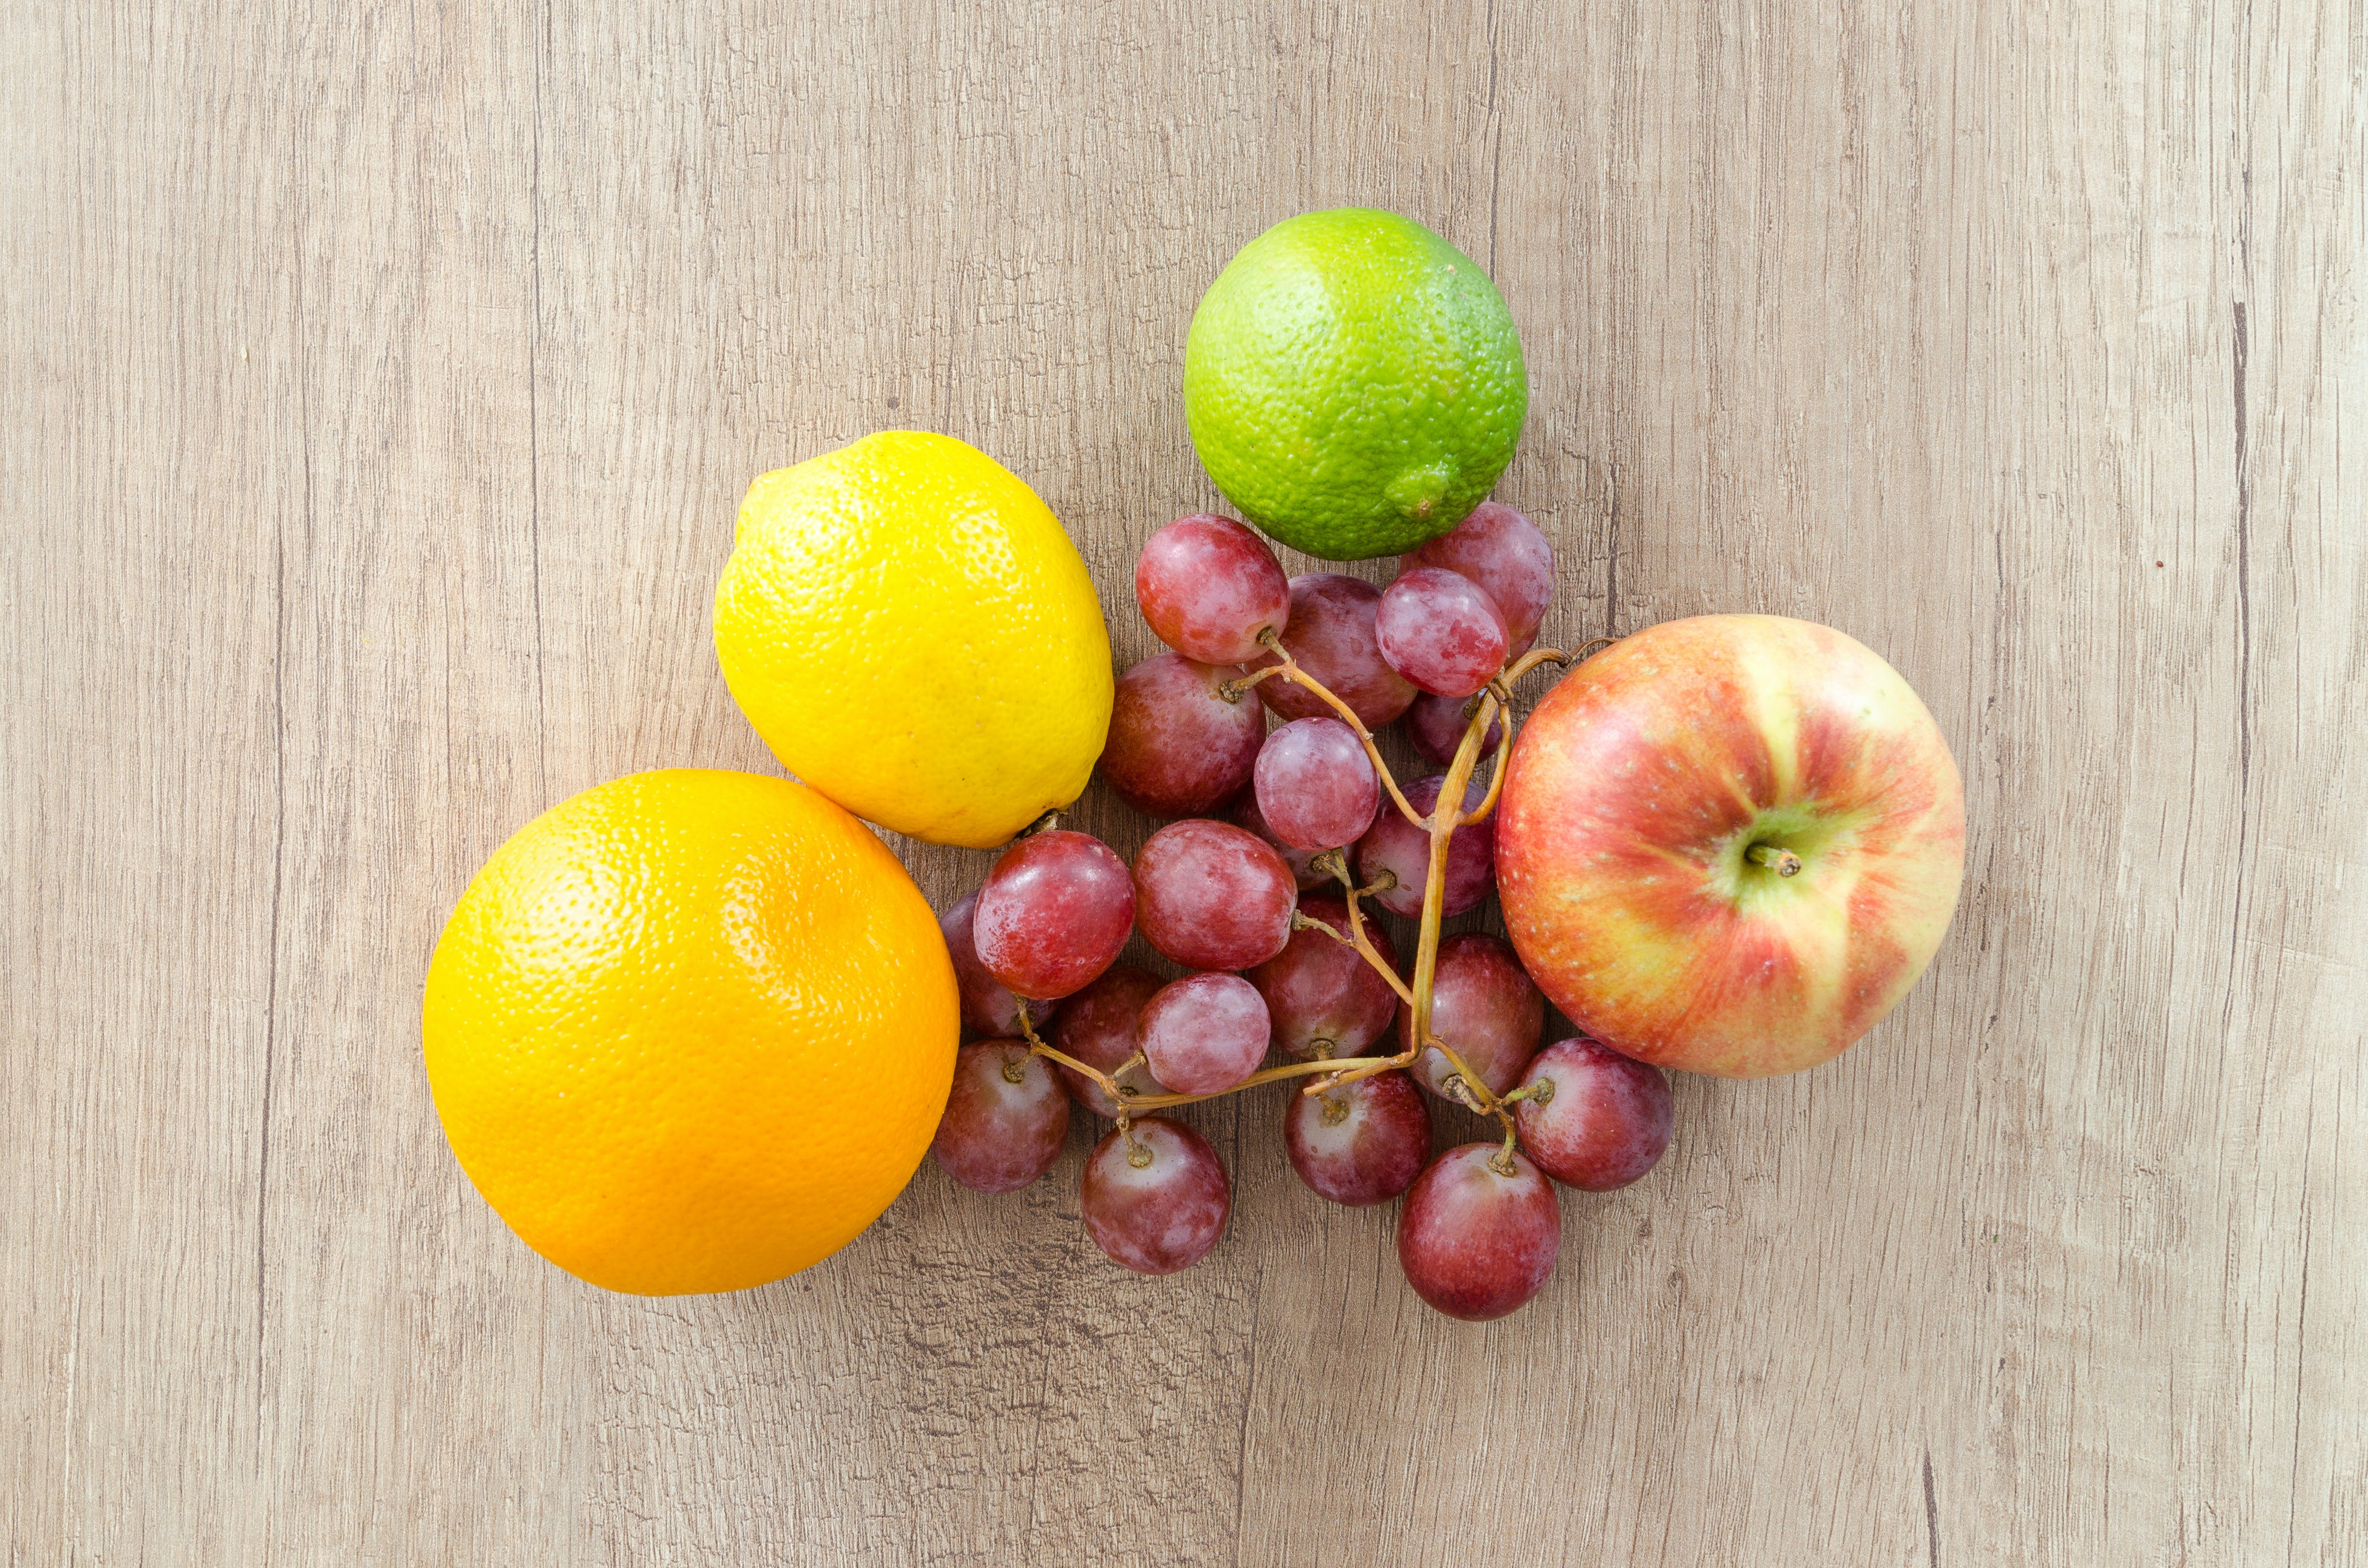 Immagine gratuita di agrume, agrumi, apple, arancia